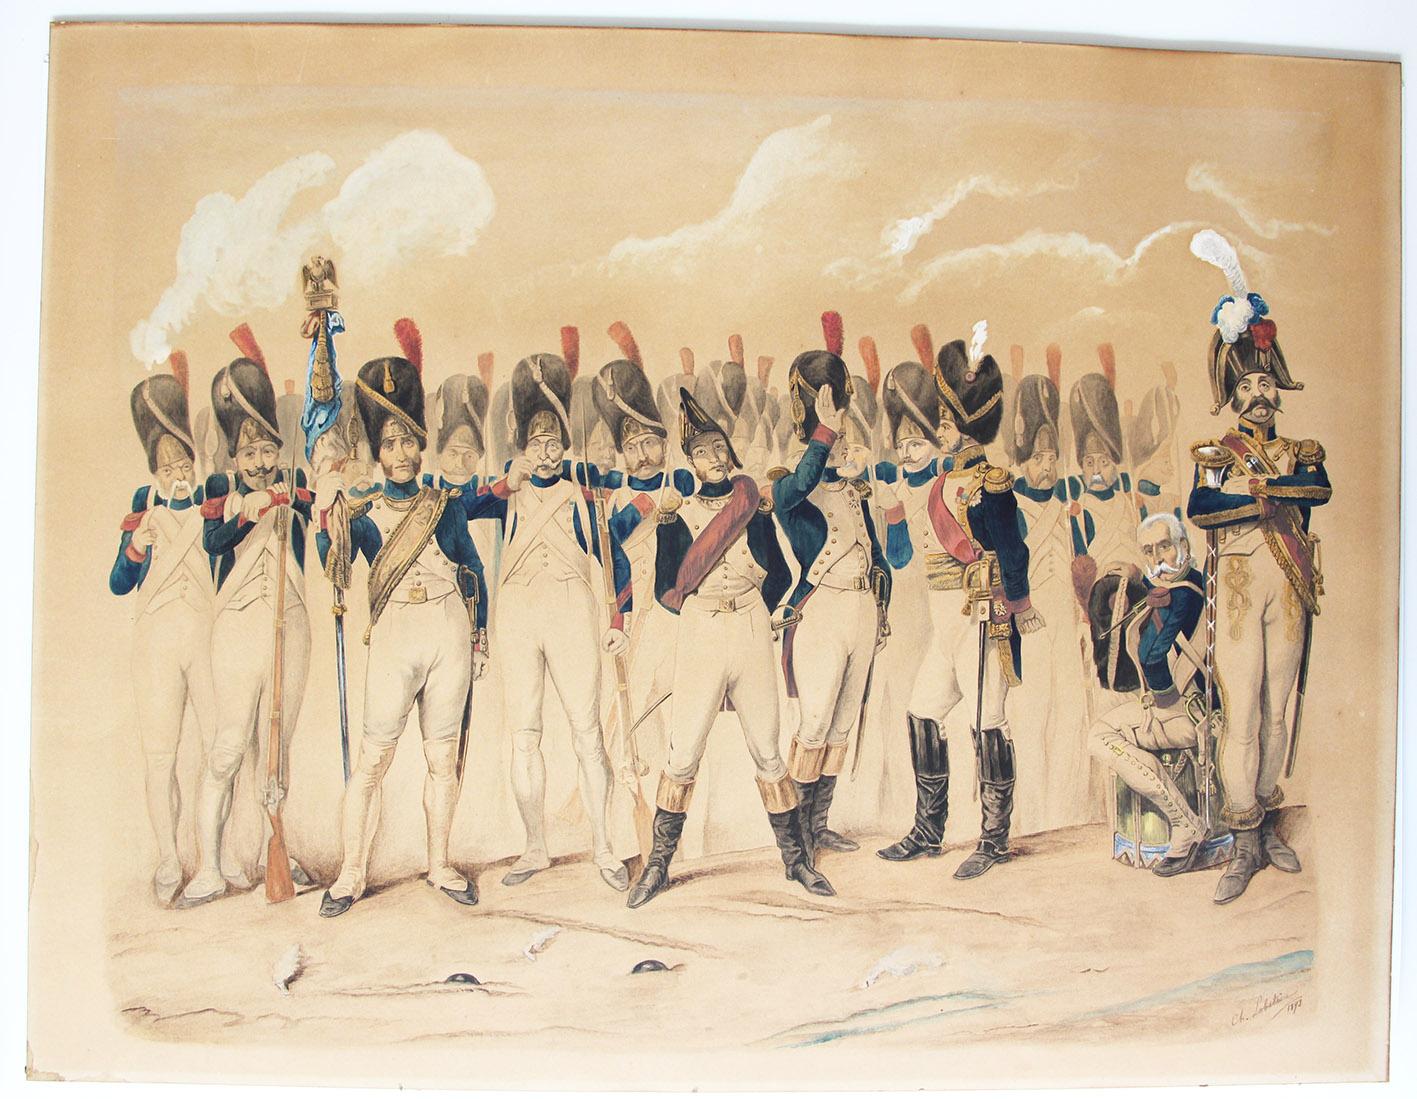 Grand Aquarelle/Dessin originale rehaussé main - Grenadiers de la Garde Impériale 1er Empire -